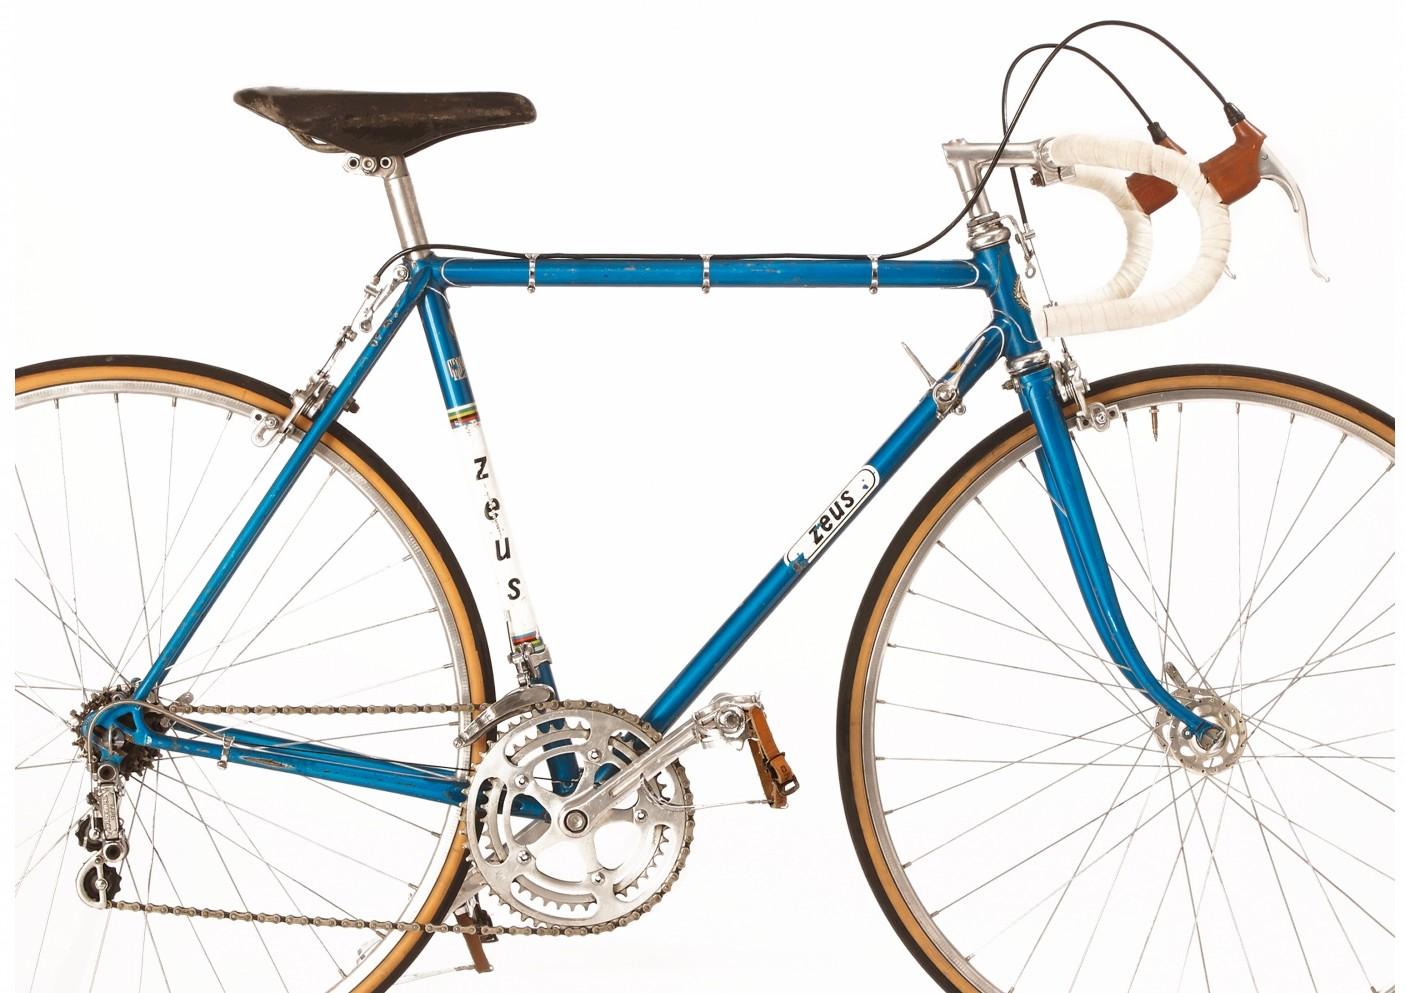 Vintage Bicycle Feature: 1975 Zeus | Mariposa Bicycles